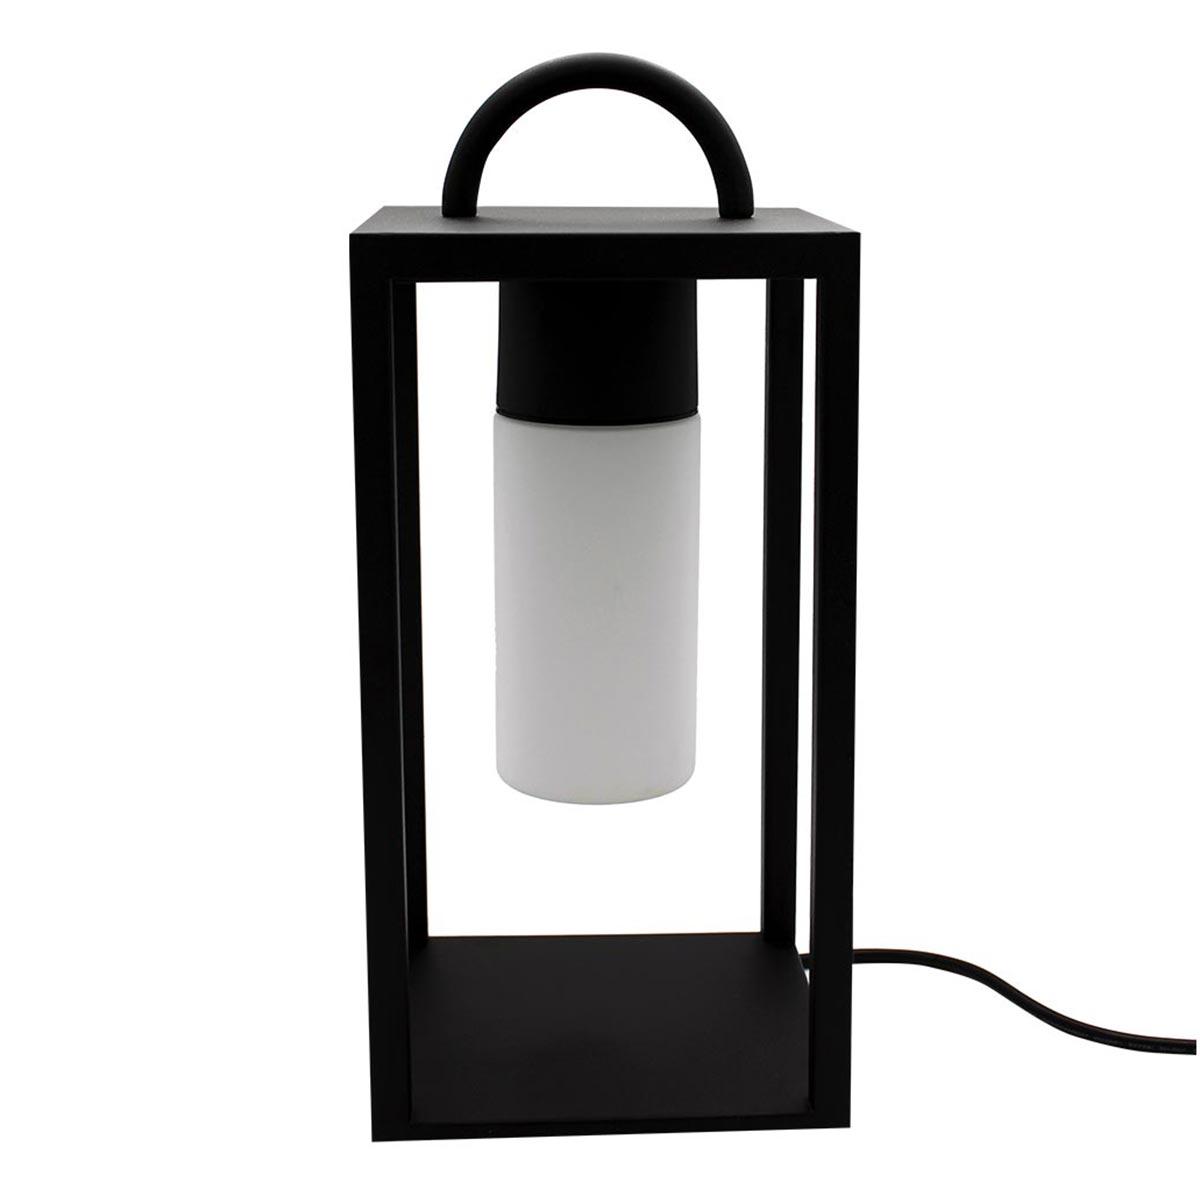 JAZZ-Lanterne filaire nomade acier noir H46cm